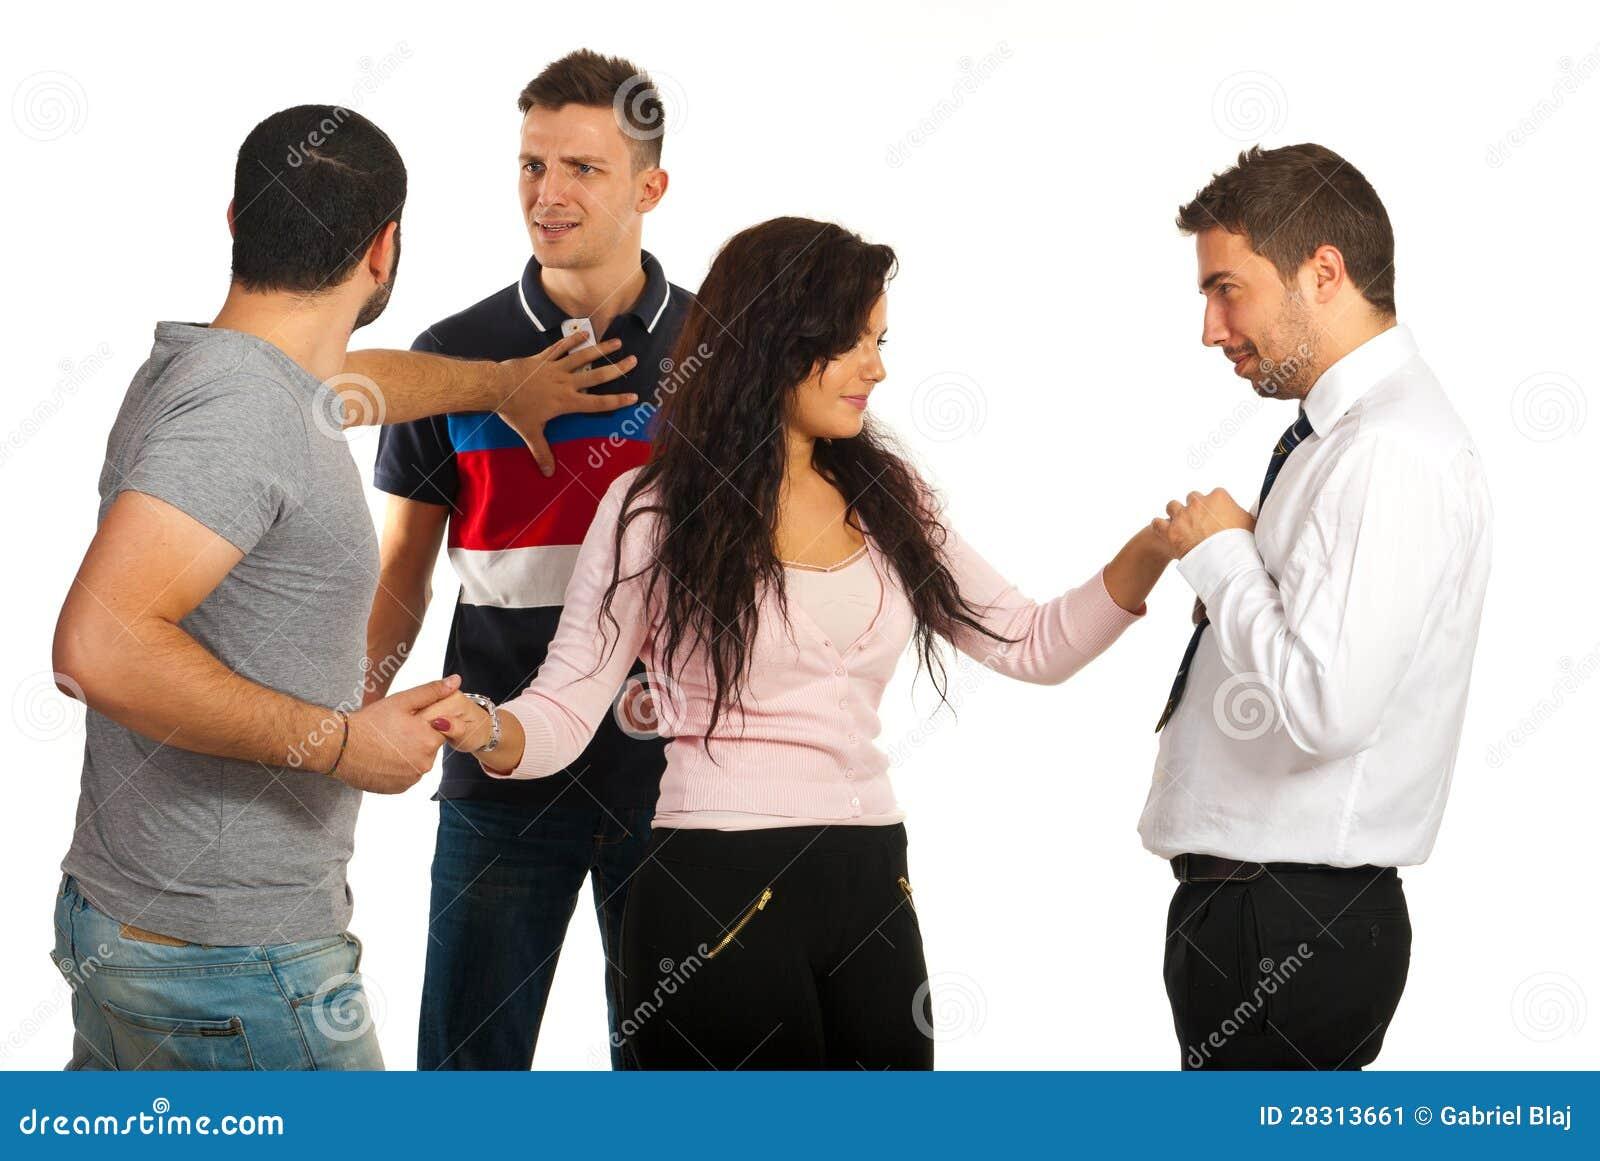 Dating 2 guys at same time